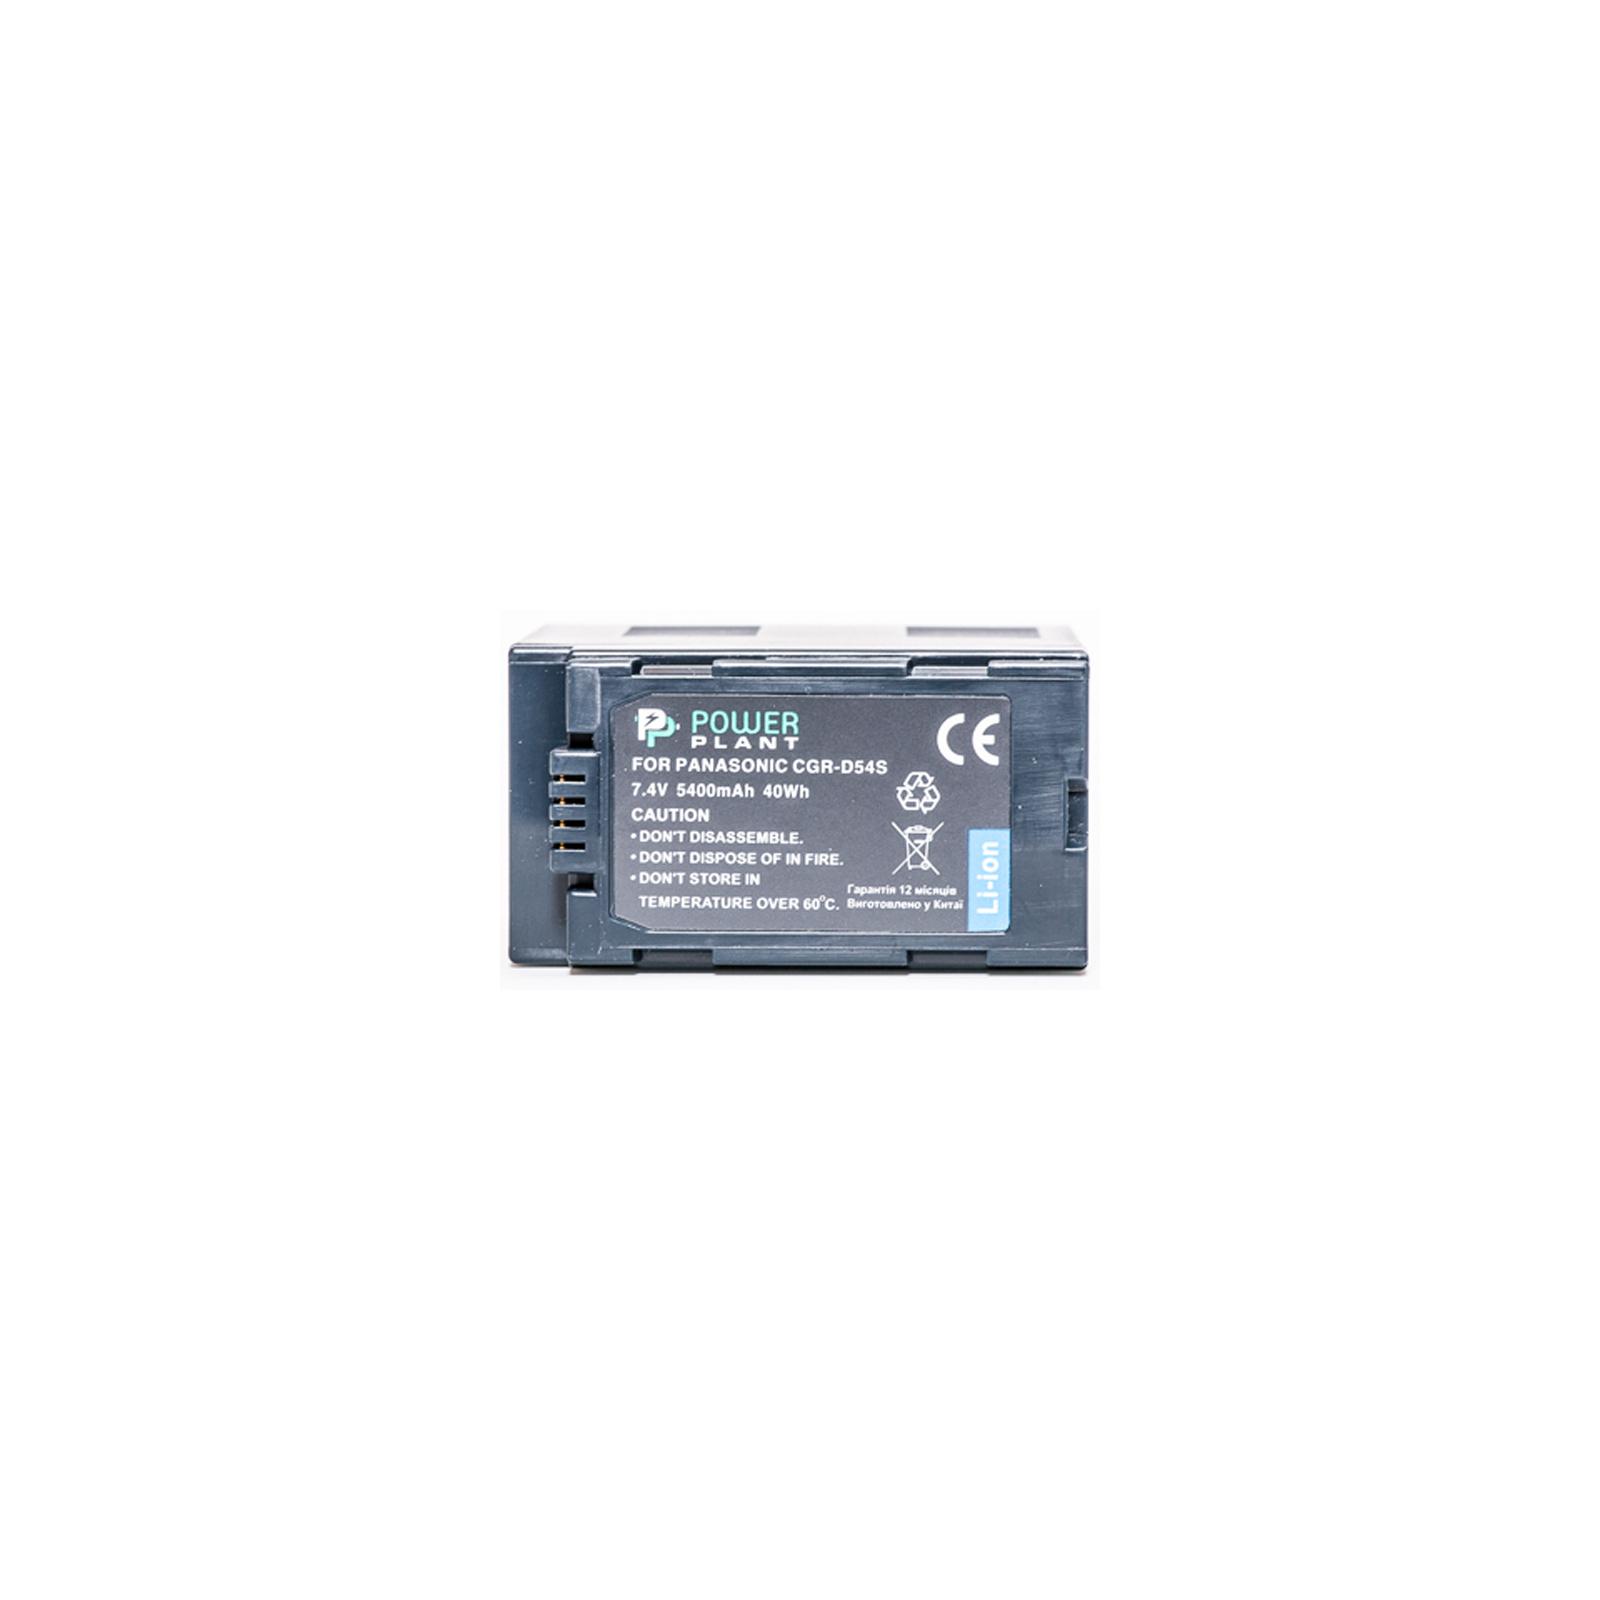 Аккумулятор к фото/видео PowerPlant Panasonic CGA-D54S (DV00DV1249) изображение 2